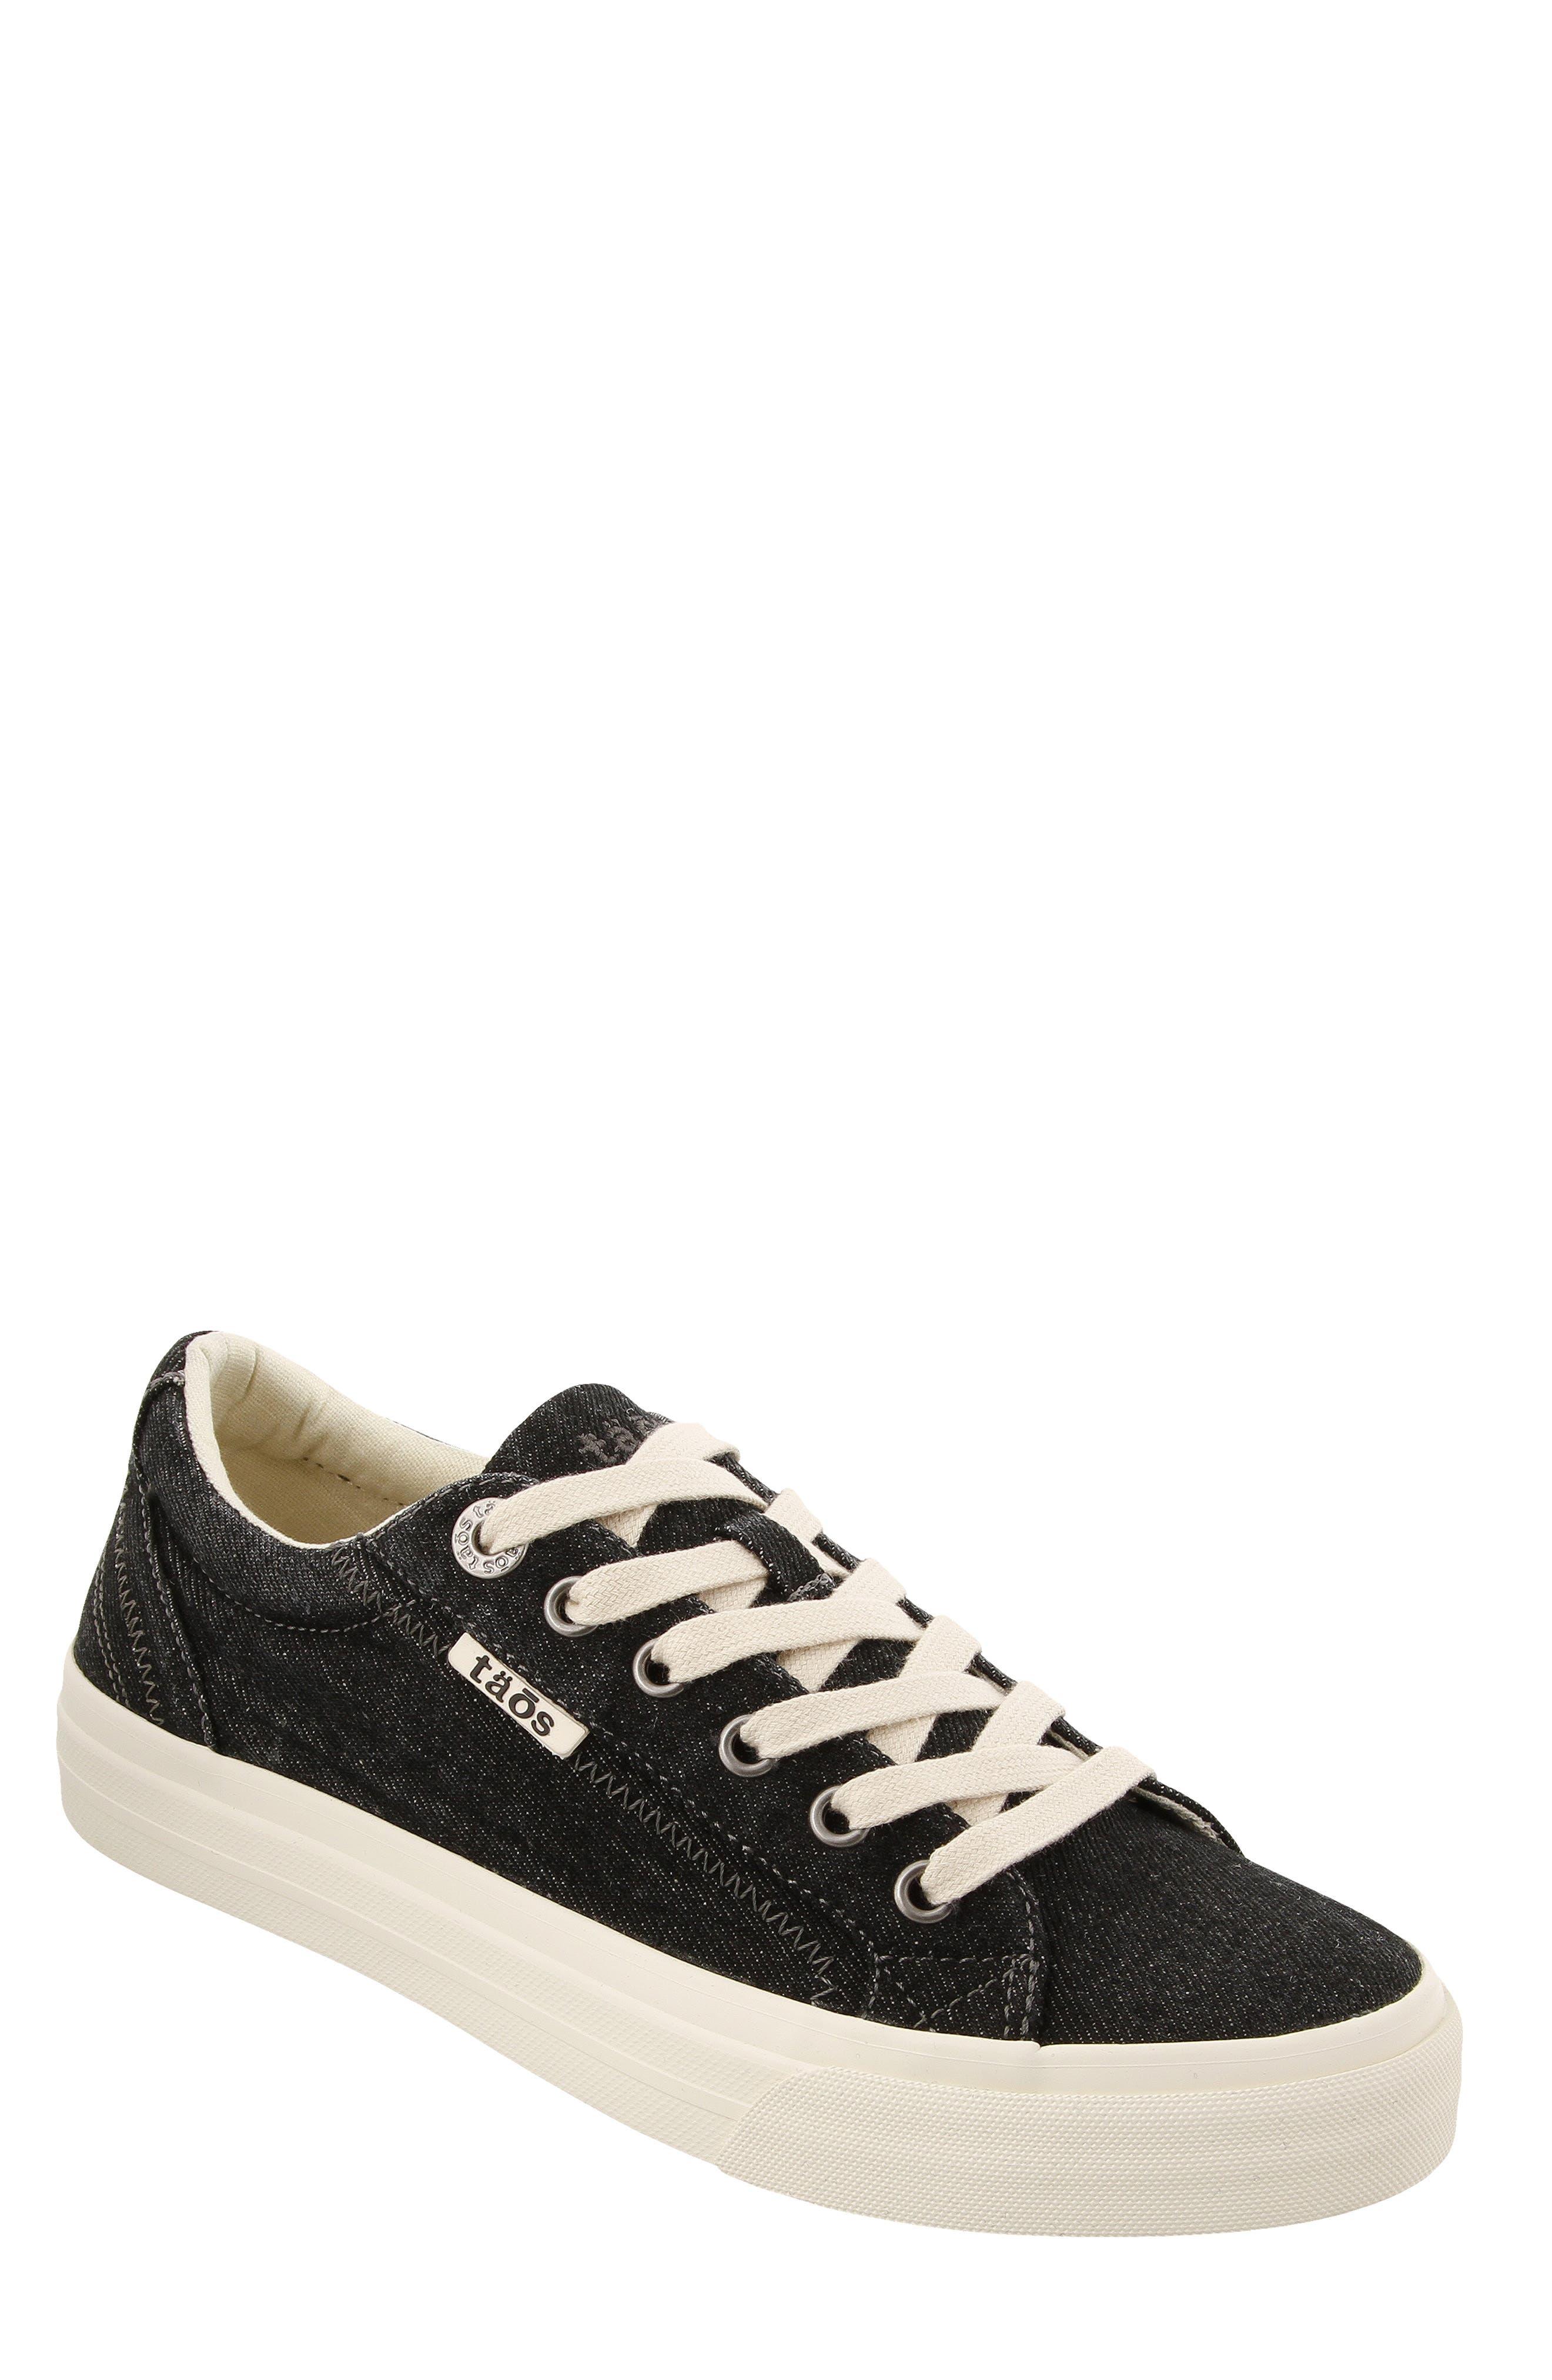 Plim Soul Sneaker,                             Main thumbnail 1, color,                             BLACK DENIM FABRIC